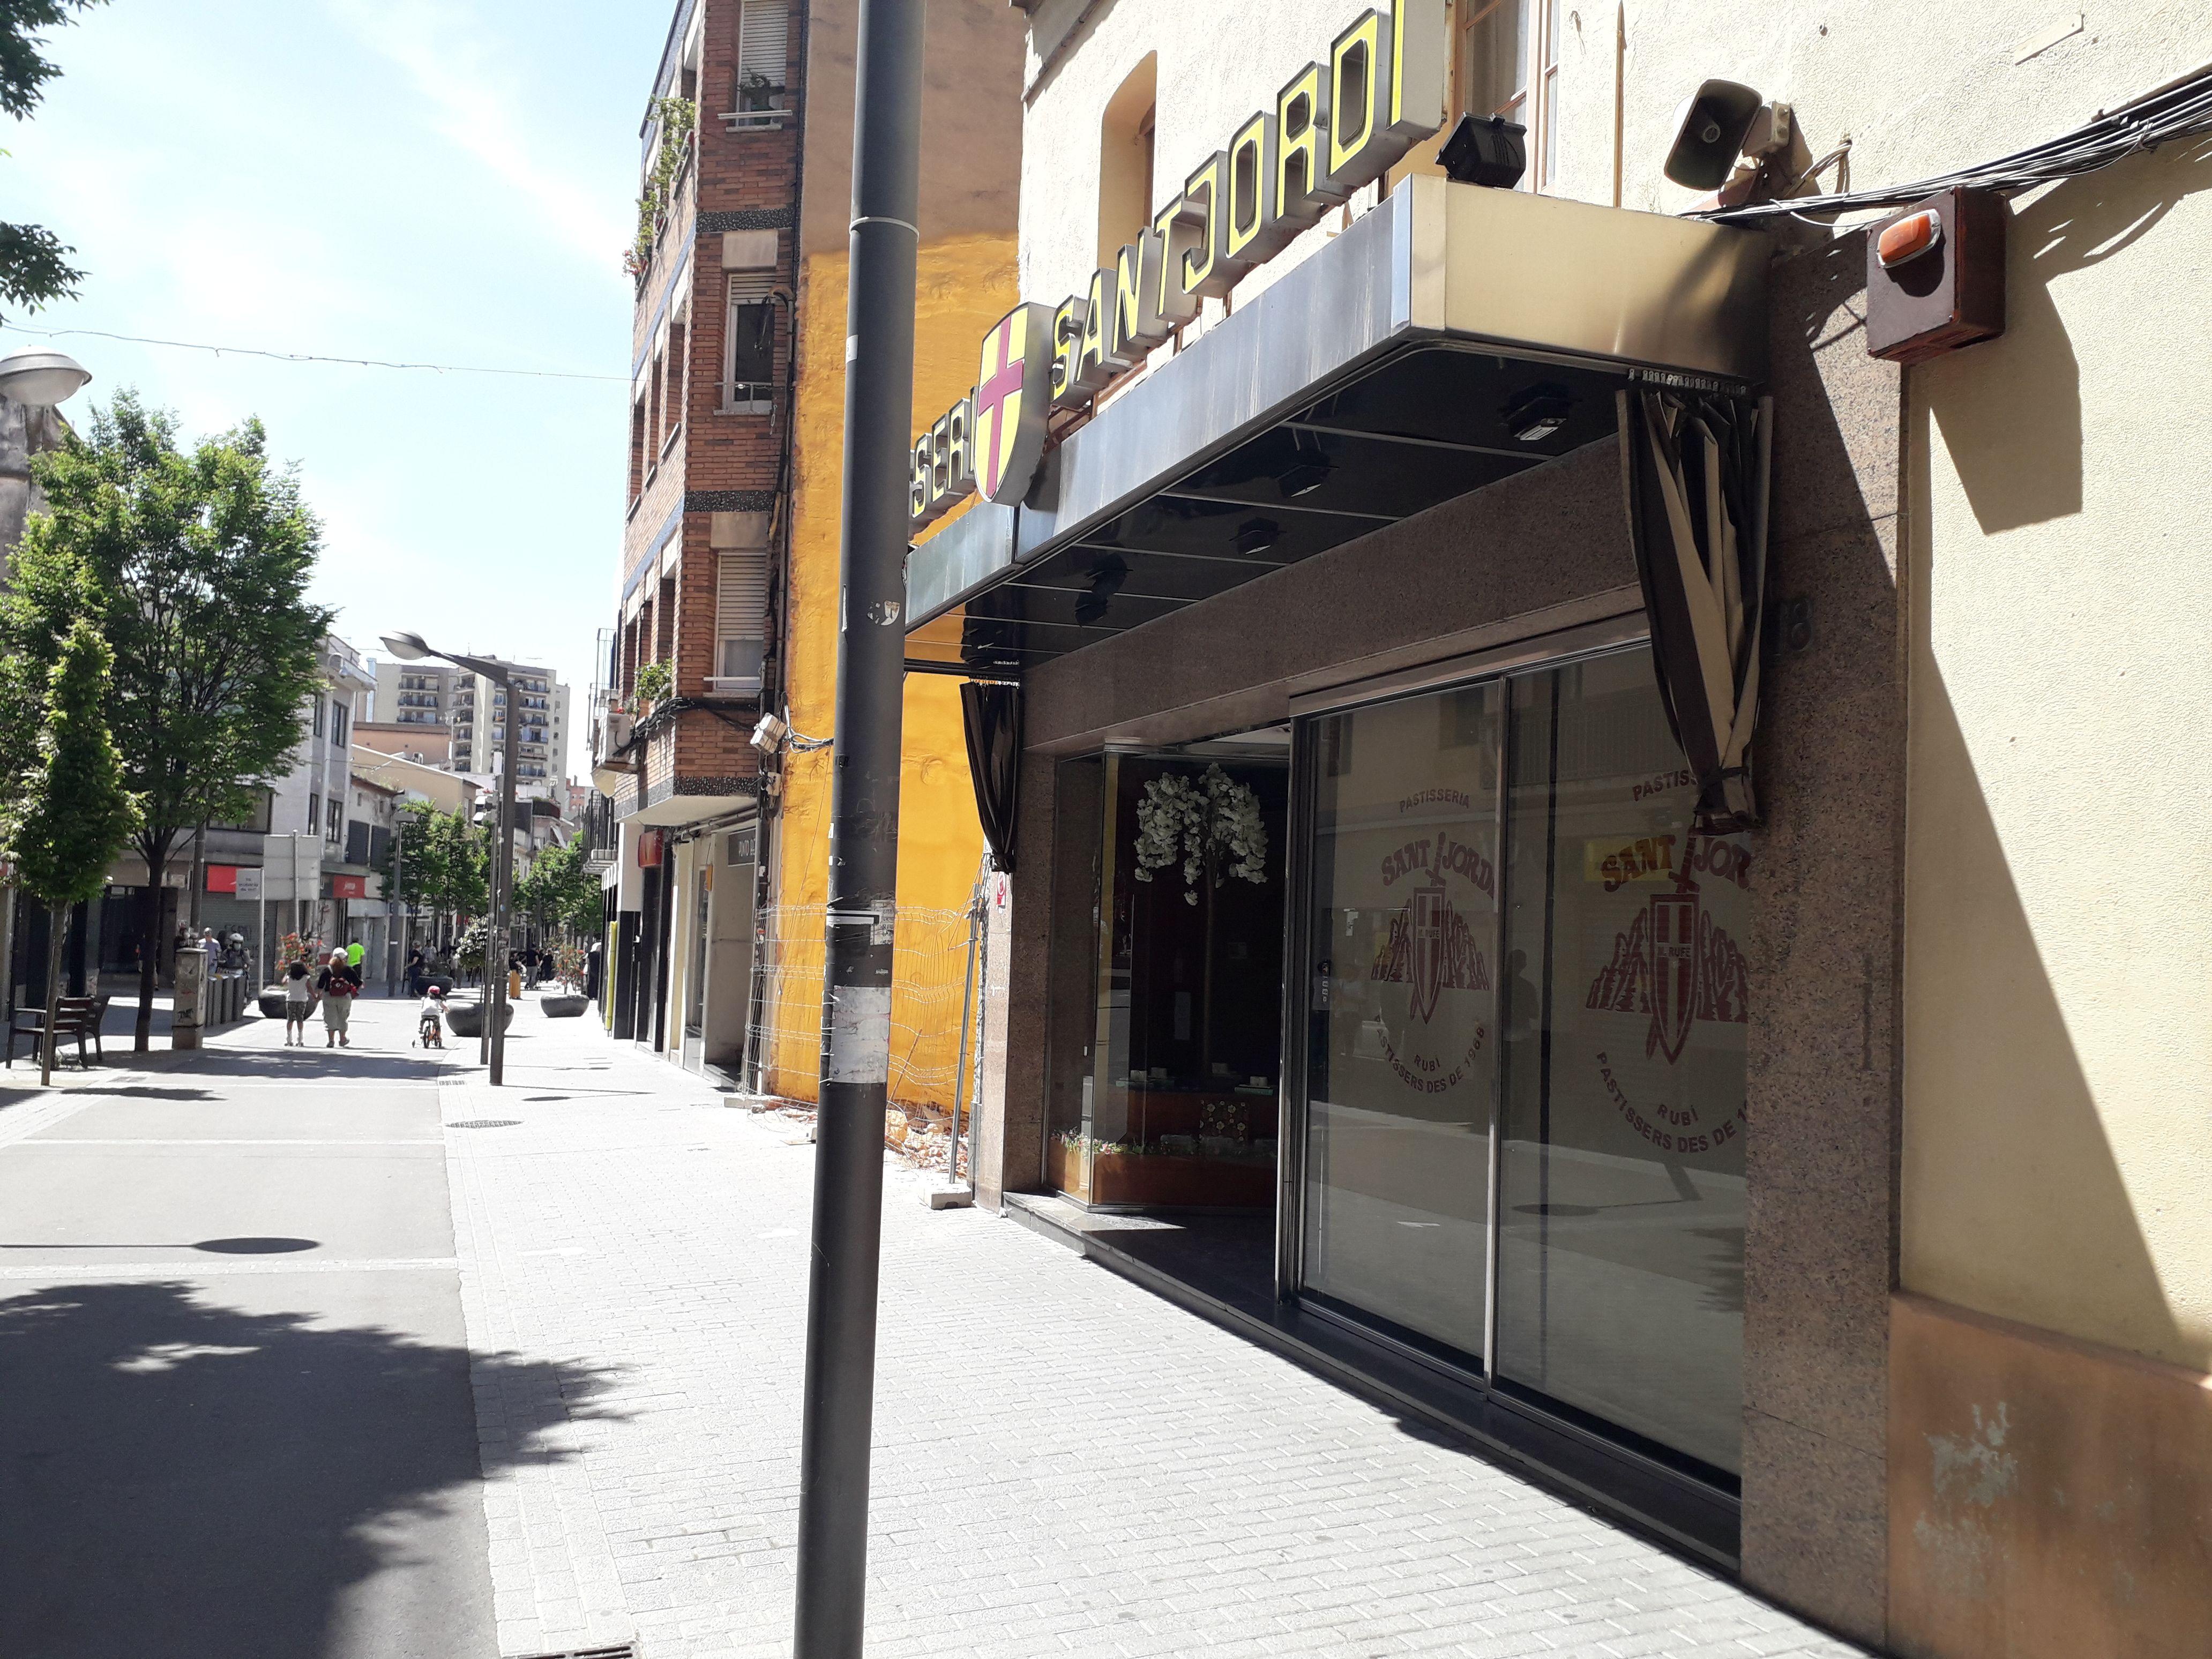 Pastiseria Sant Jordi. FONT: Núria HS